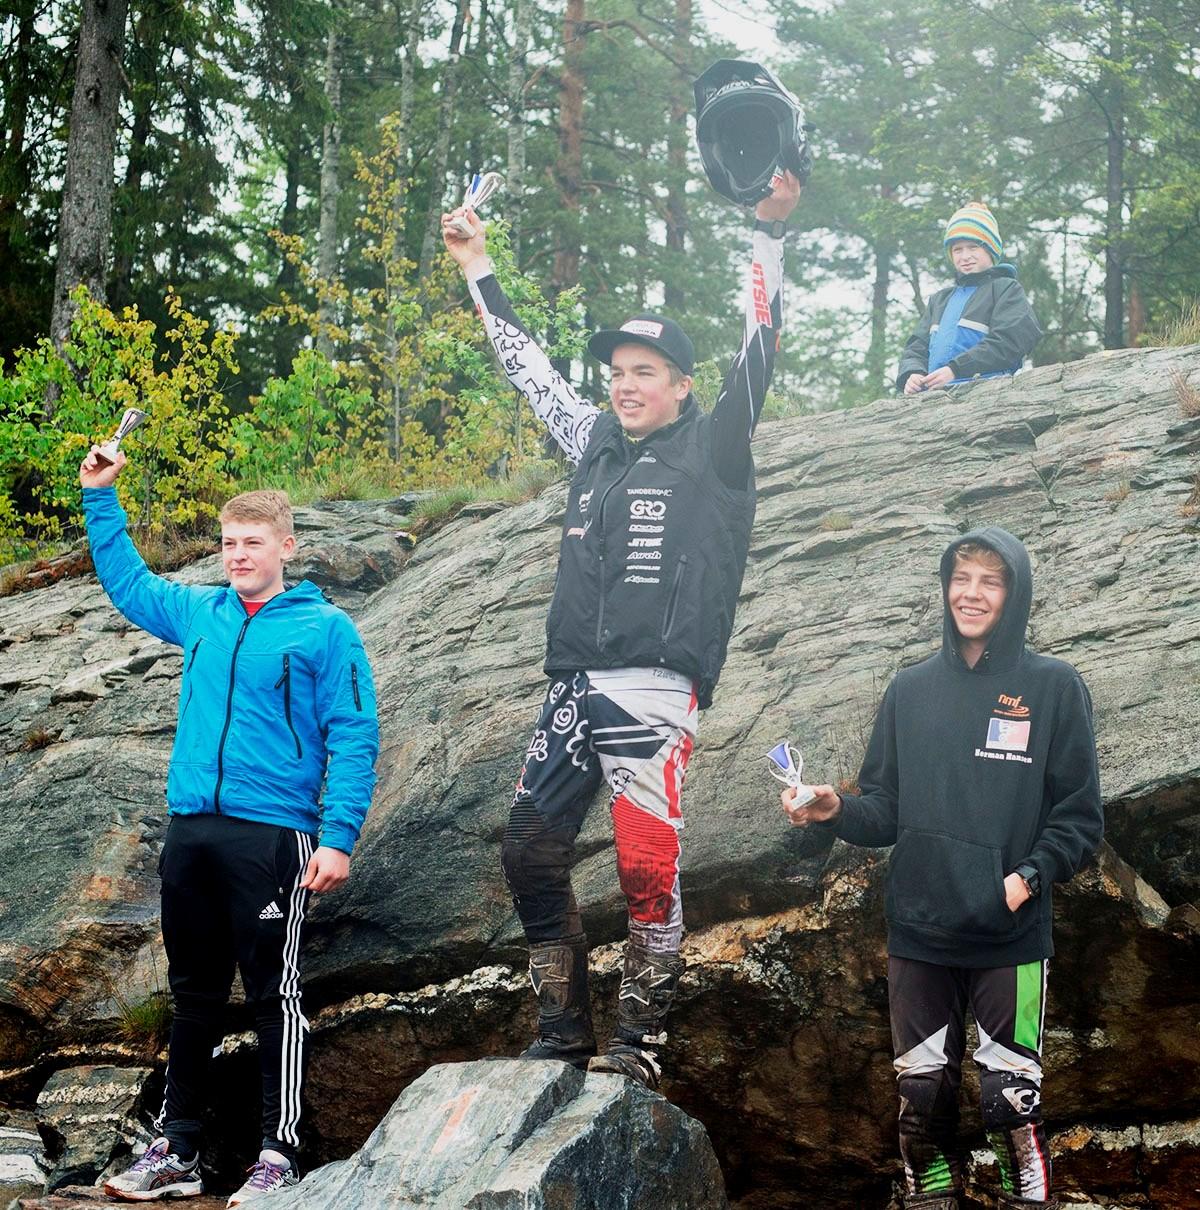 A-klassen! Sander Sørbye (Eiker), Andreas Sollie Andersen(Nesodden) og Herman Brockstedt Hansen (Skiptvet)